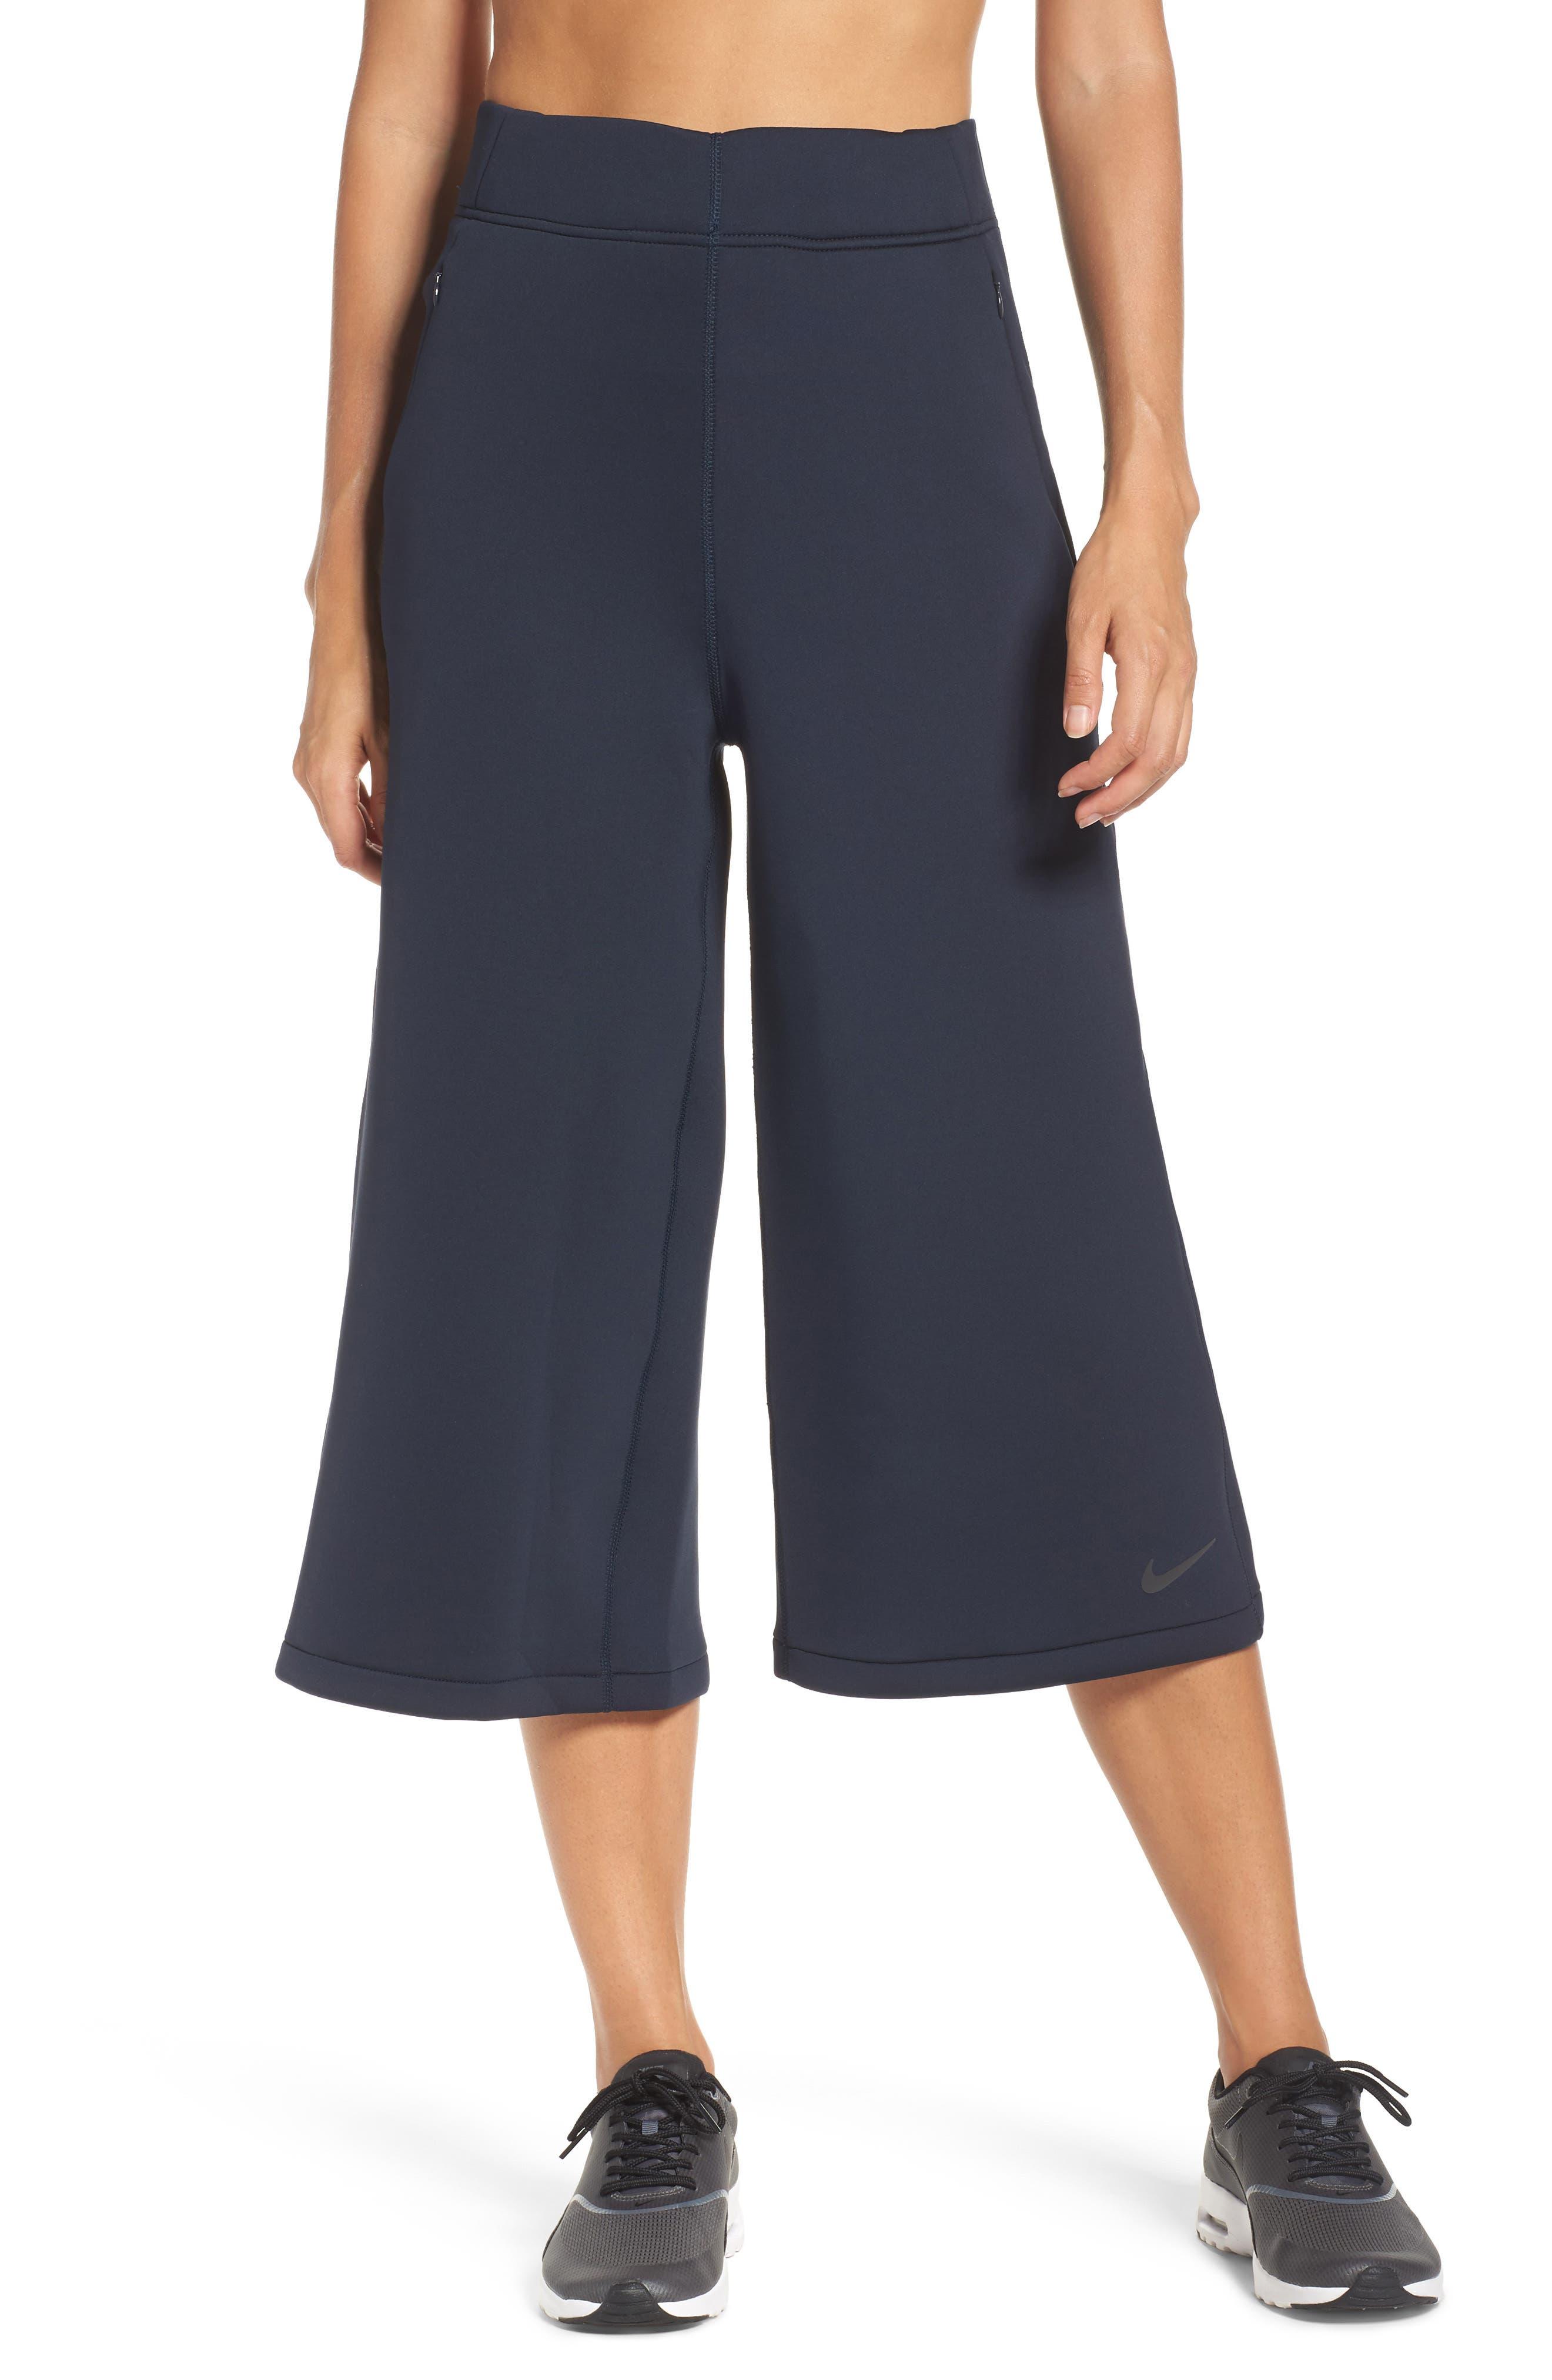 Alternate Image 1 Selected - Nike Therma Sphere Max Crop Pants